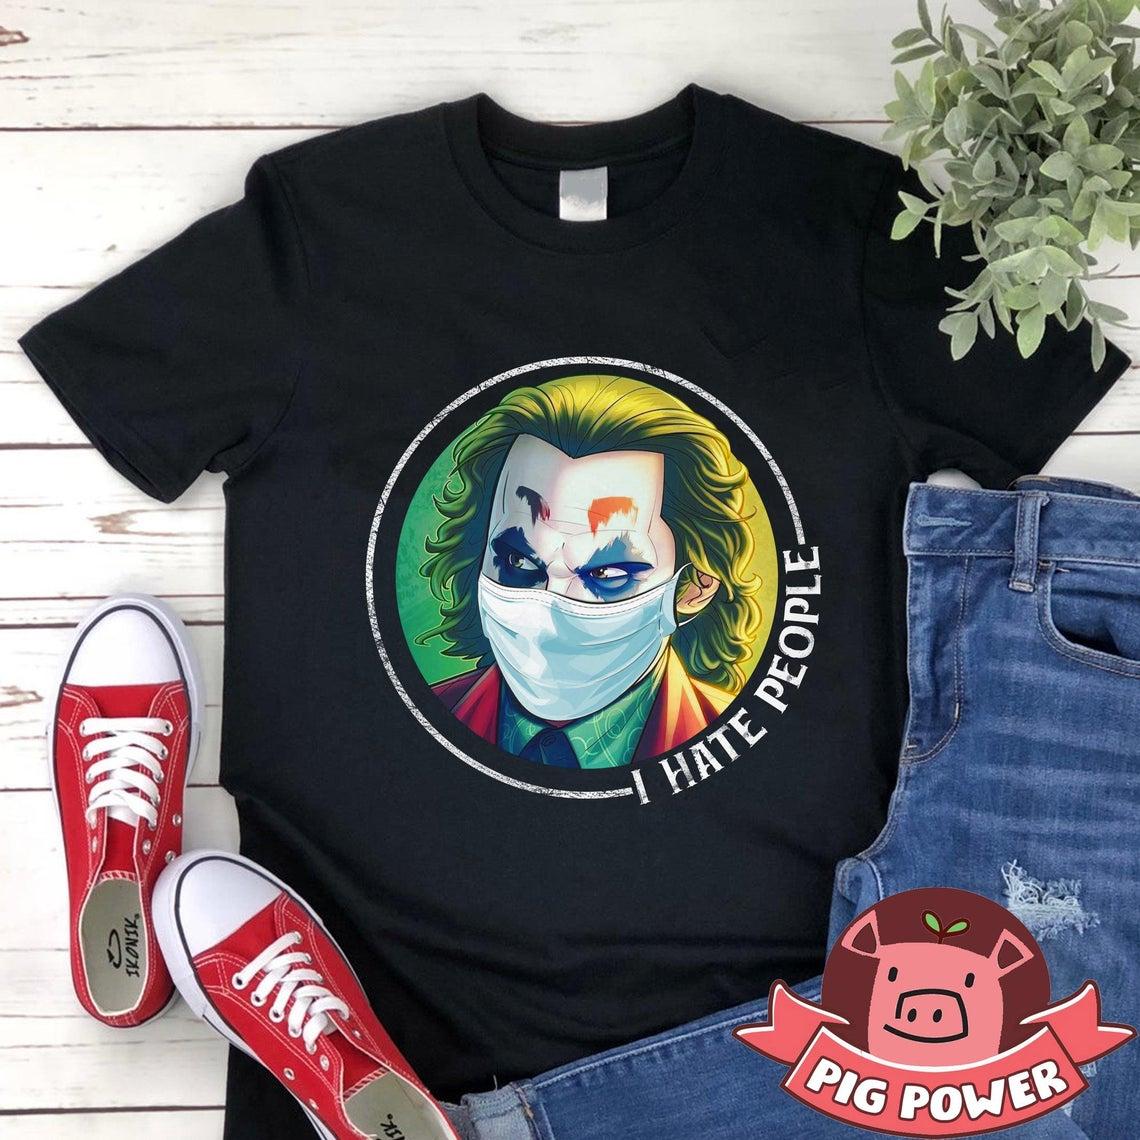 I Hate People Shirt Joker T-shirt Quarantined 2020 Social Distancing